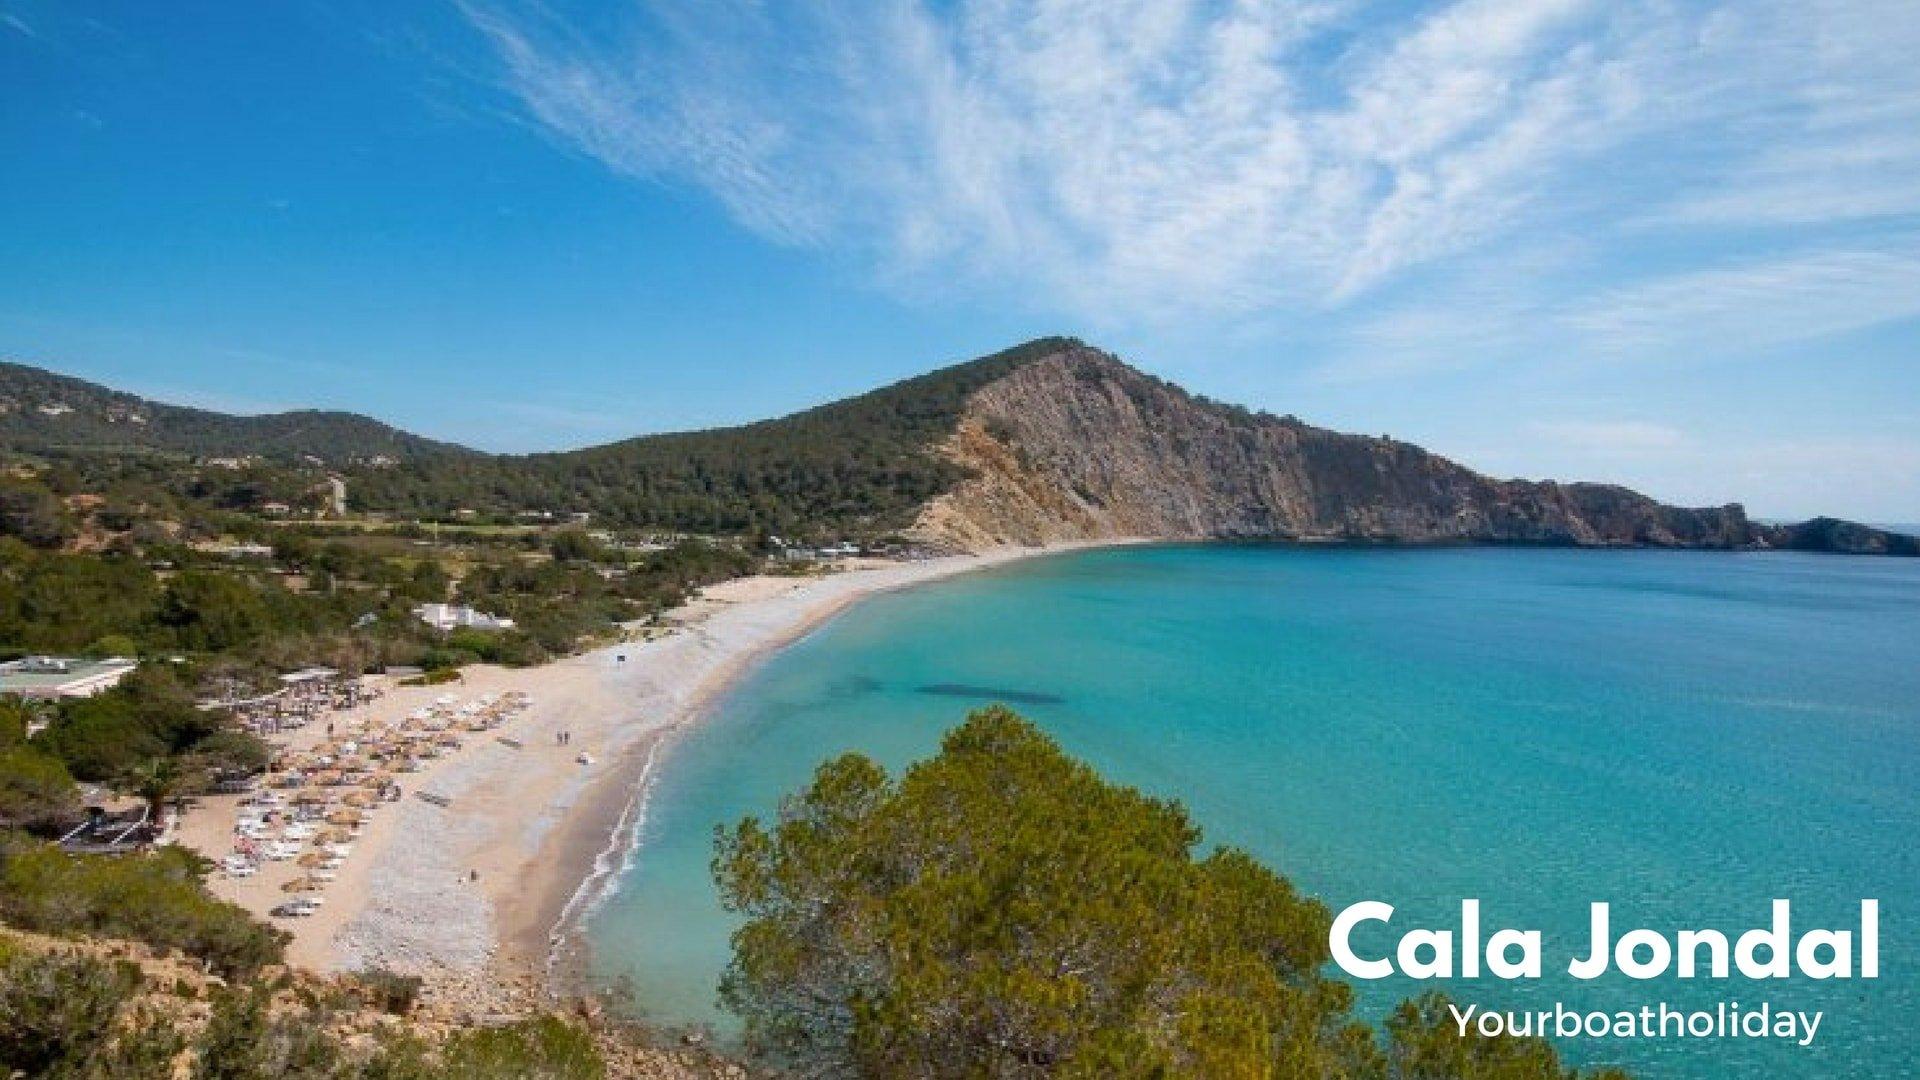 cala-jondal-ibiza-sailing-itinerary